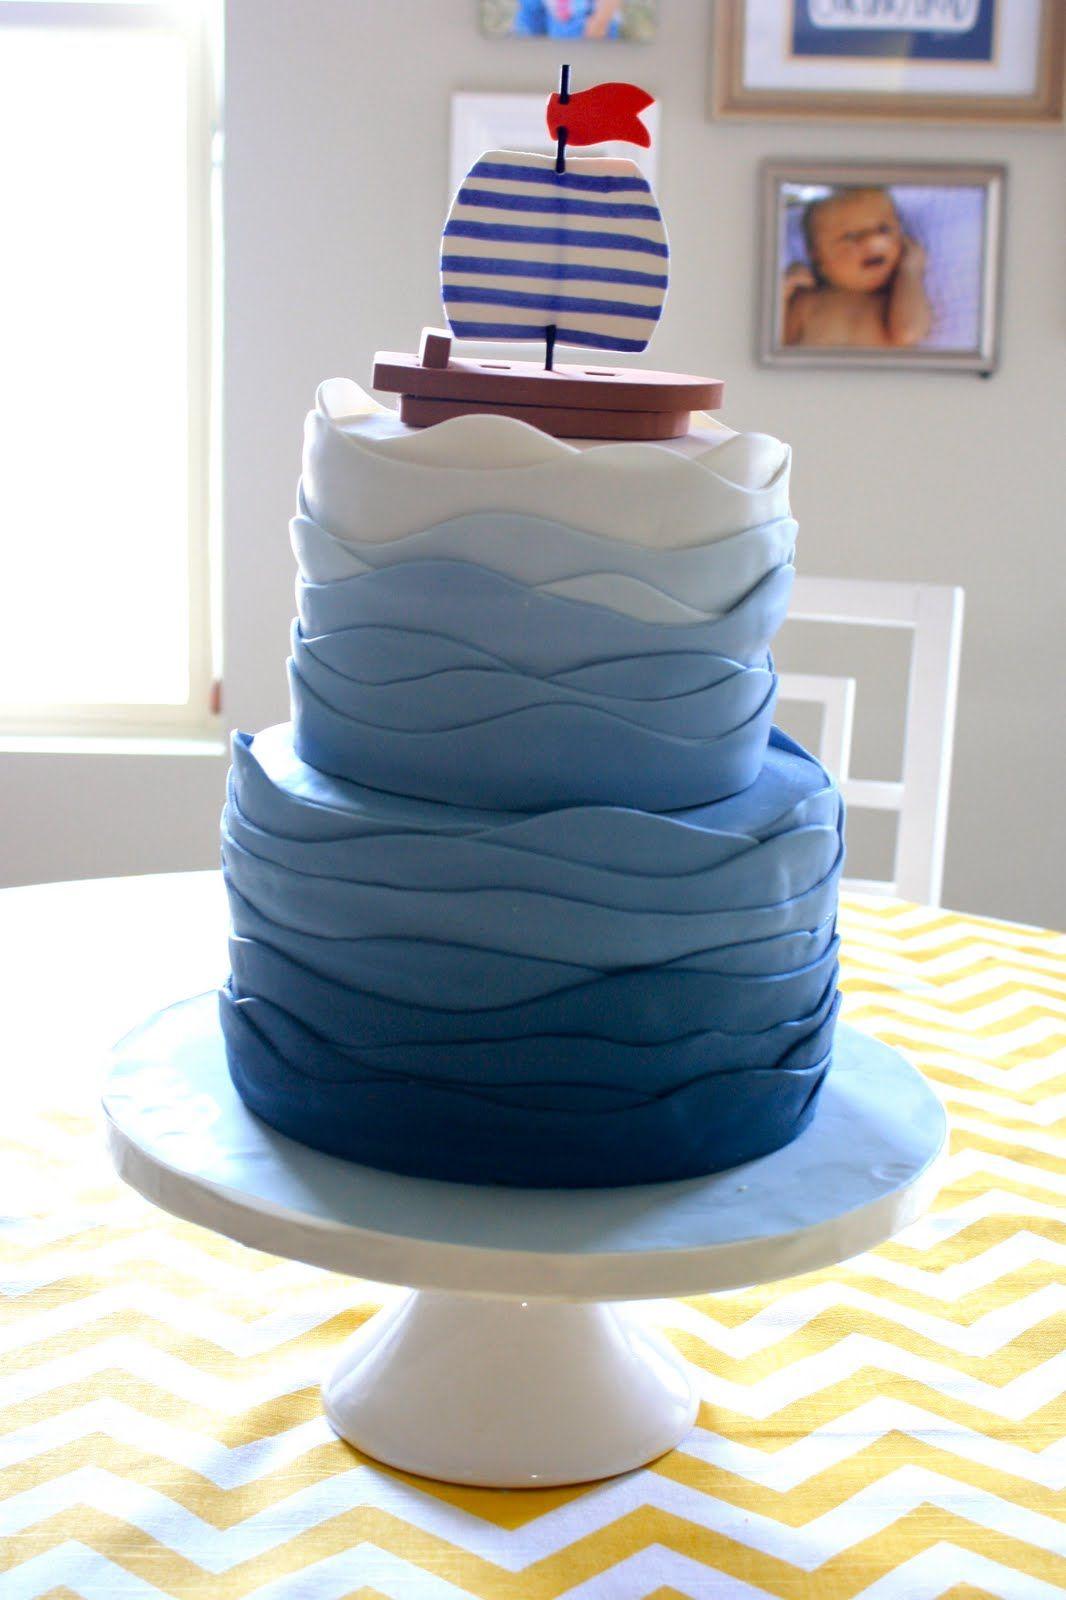 Cake ideas on pinterest pirate cakes marshmallow fondant and - Beautiful Nautical Birthday Cake